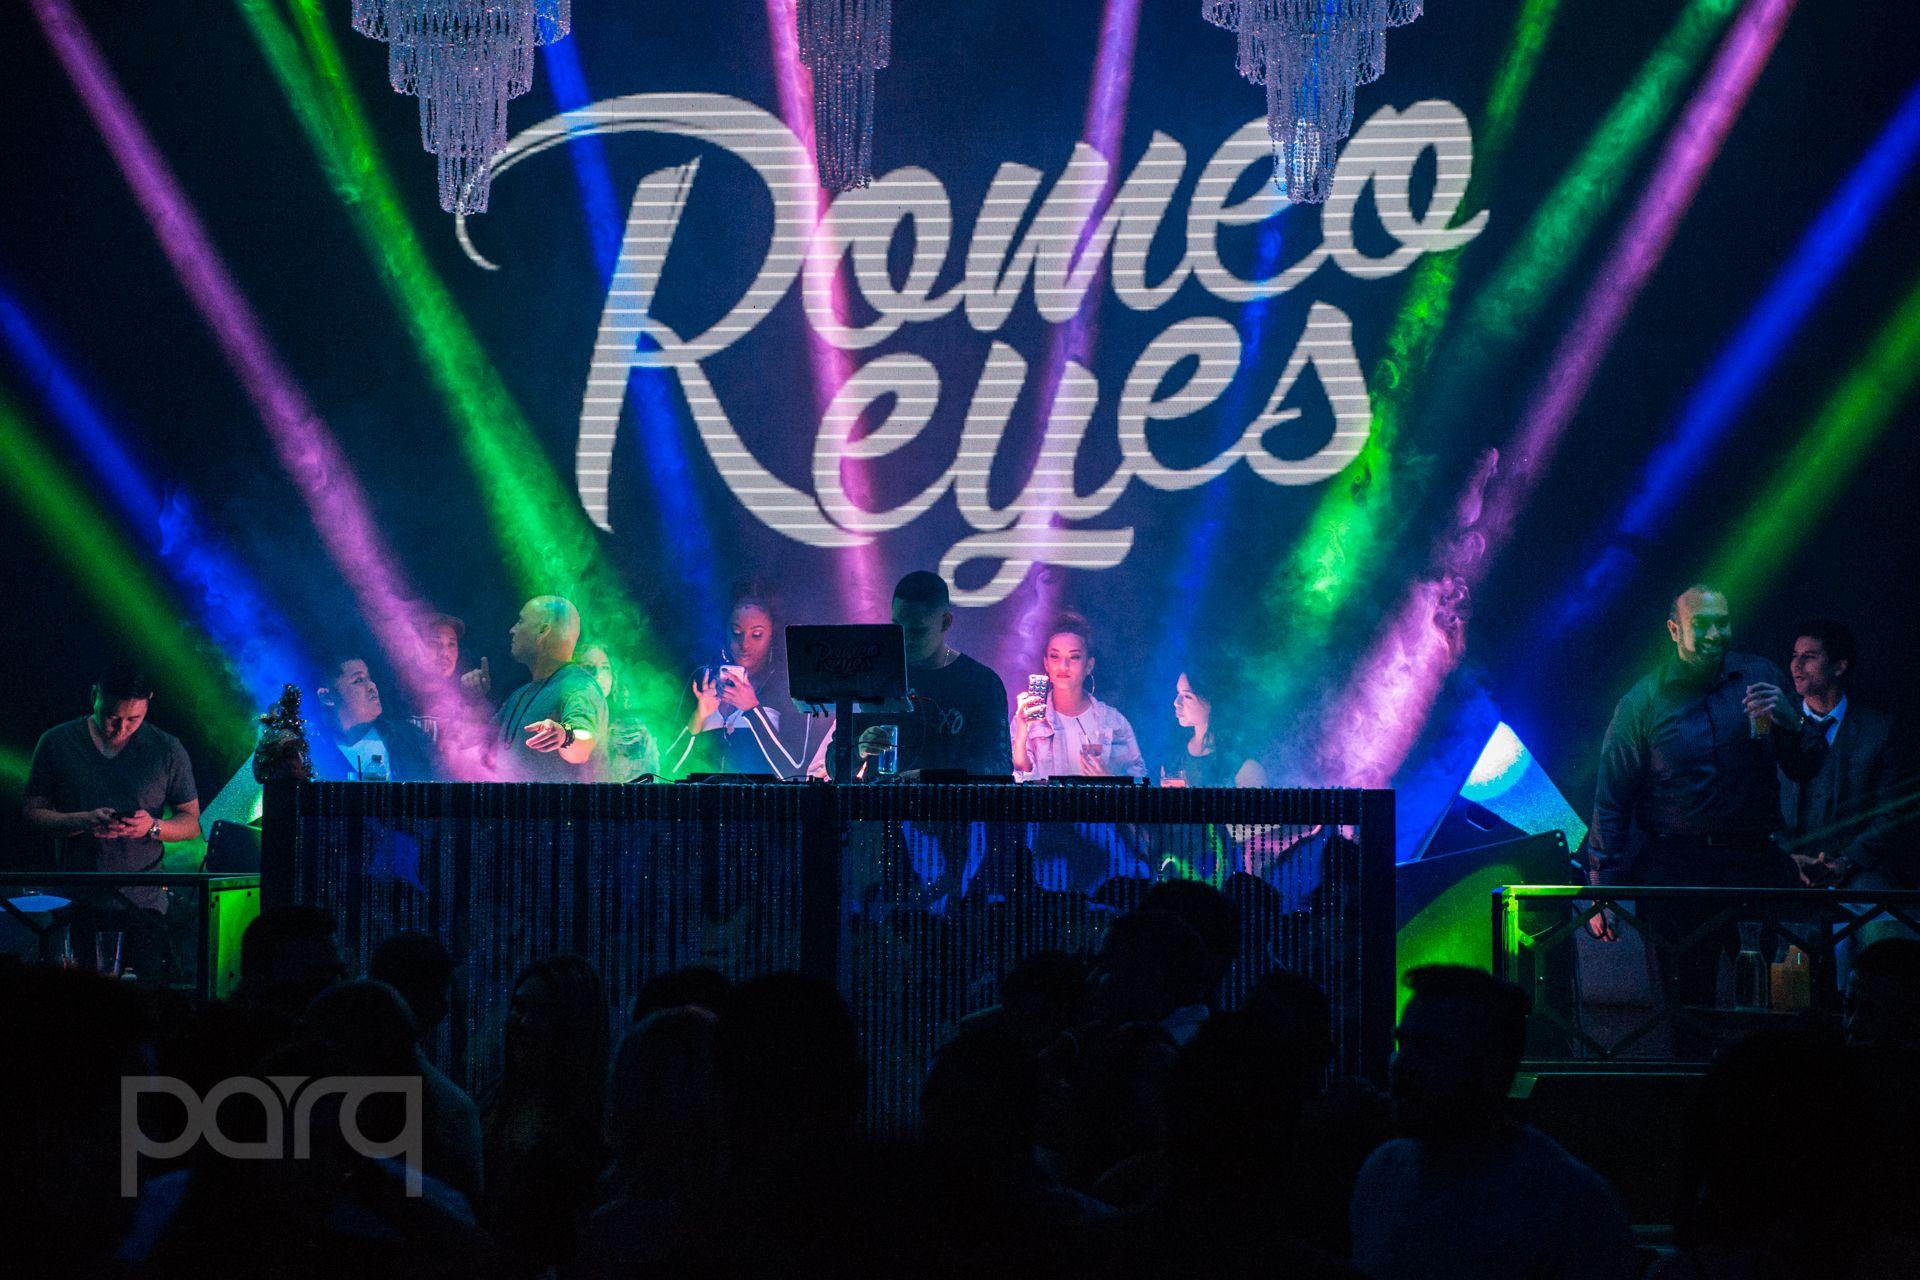 12.30.17 Parq - Romeo Reyes-1.jpg